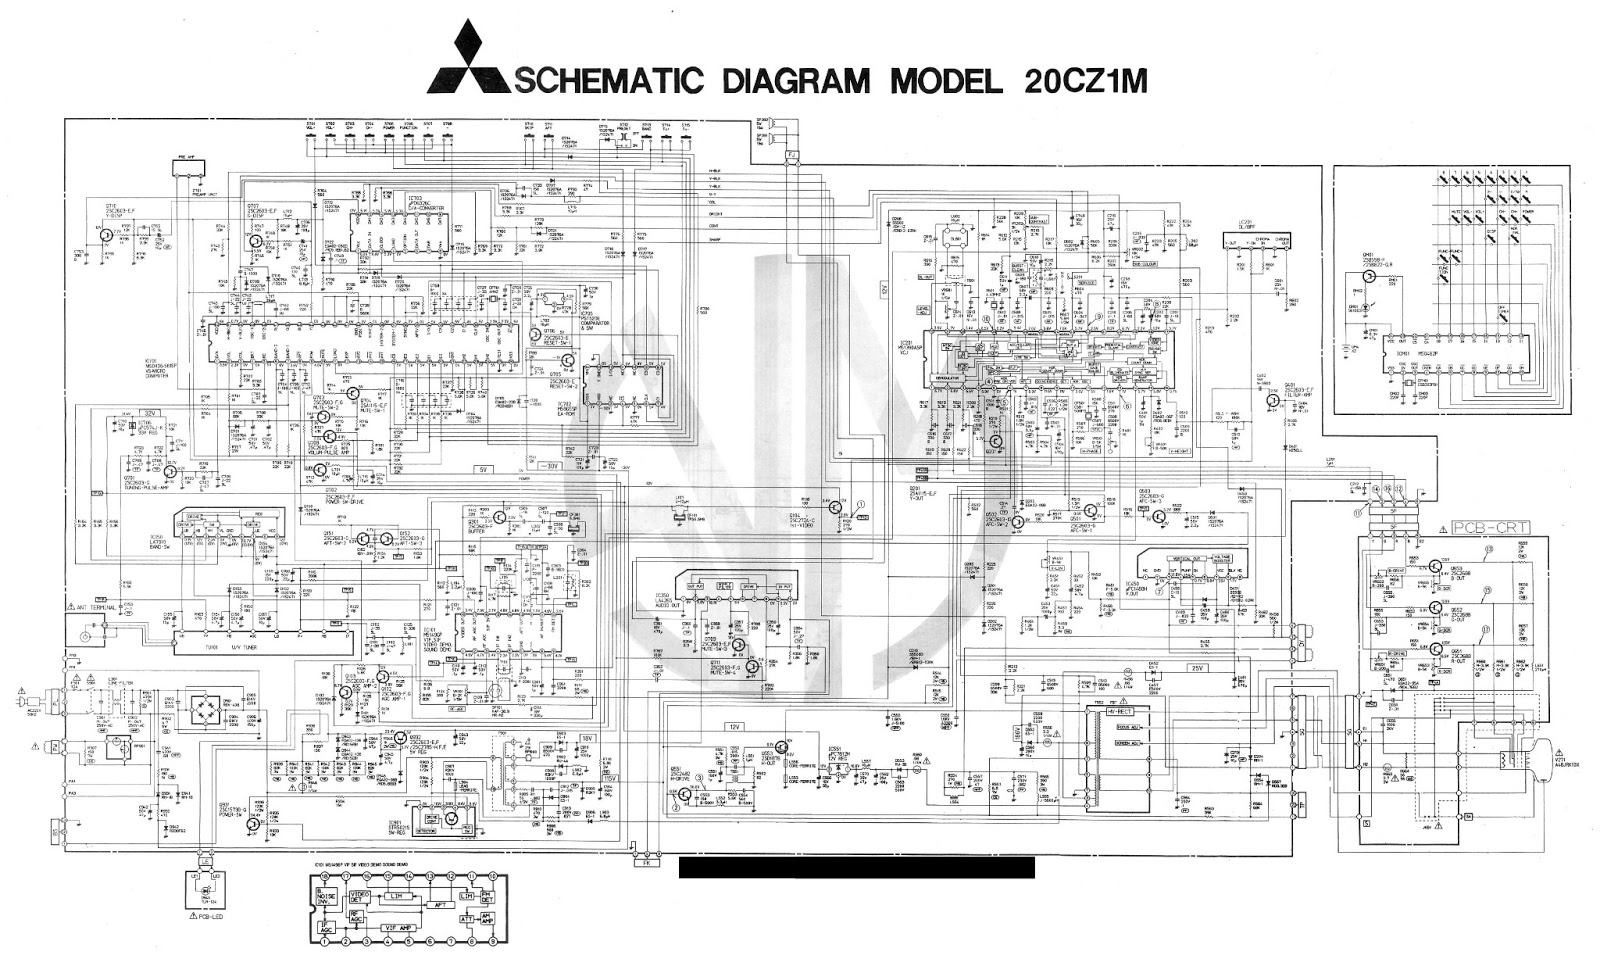 hight resolution of schematic diagram mitsubishi tv 15 13 combatarms game de u2022mitsubishi tv diagram 10 artatec automobile